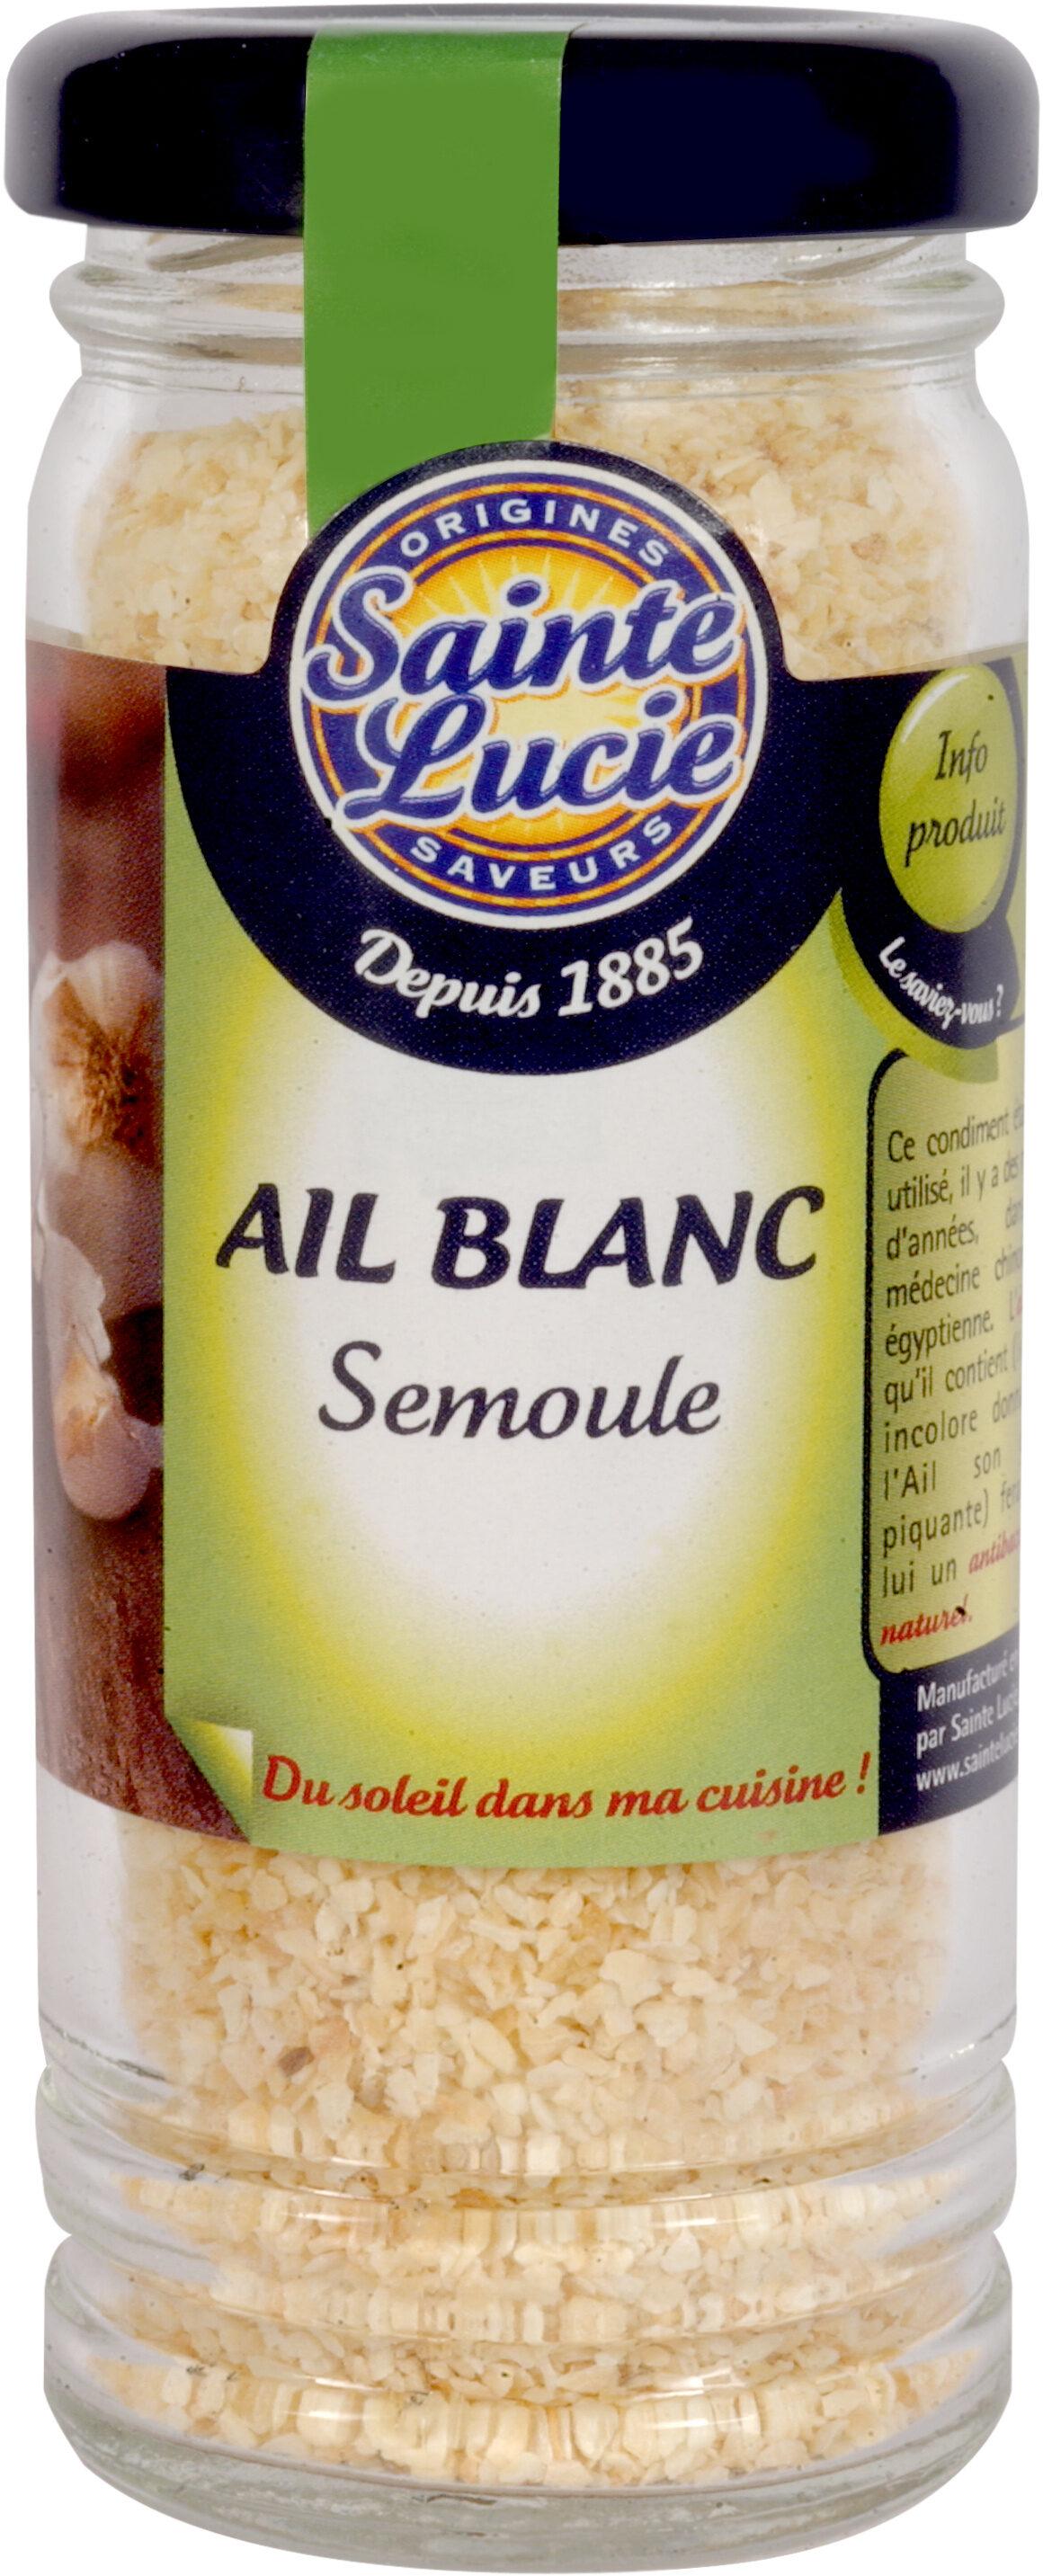 Ail blanc Semoule - Product - fr